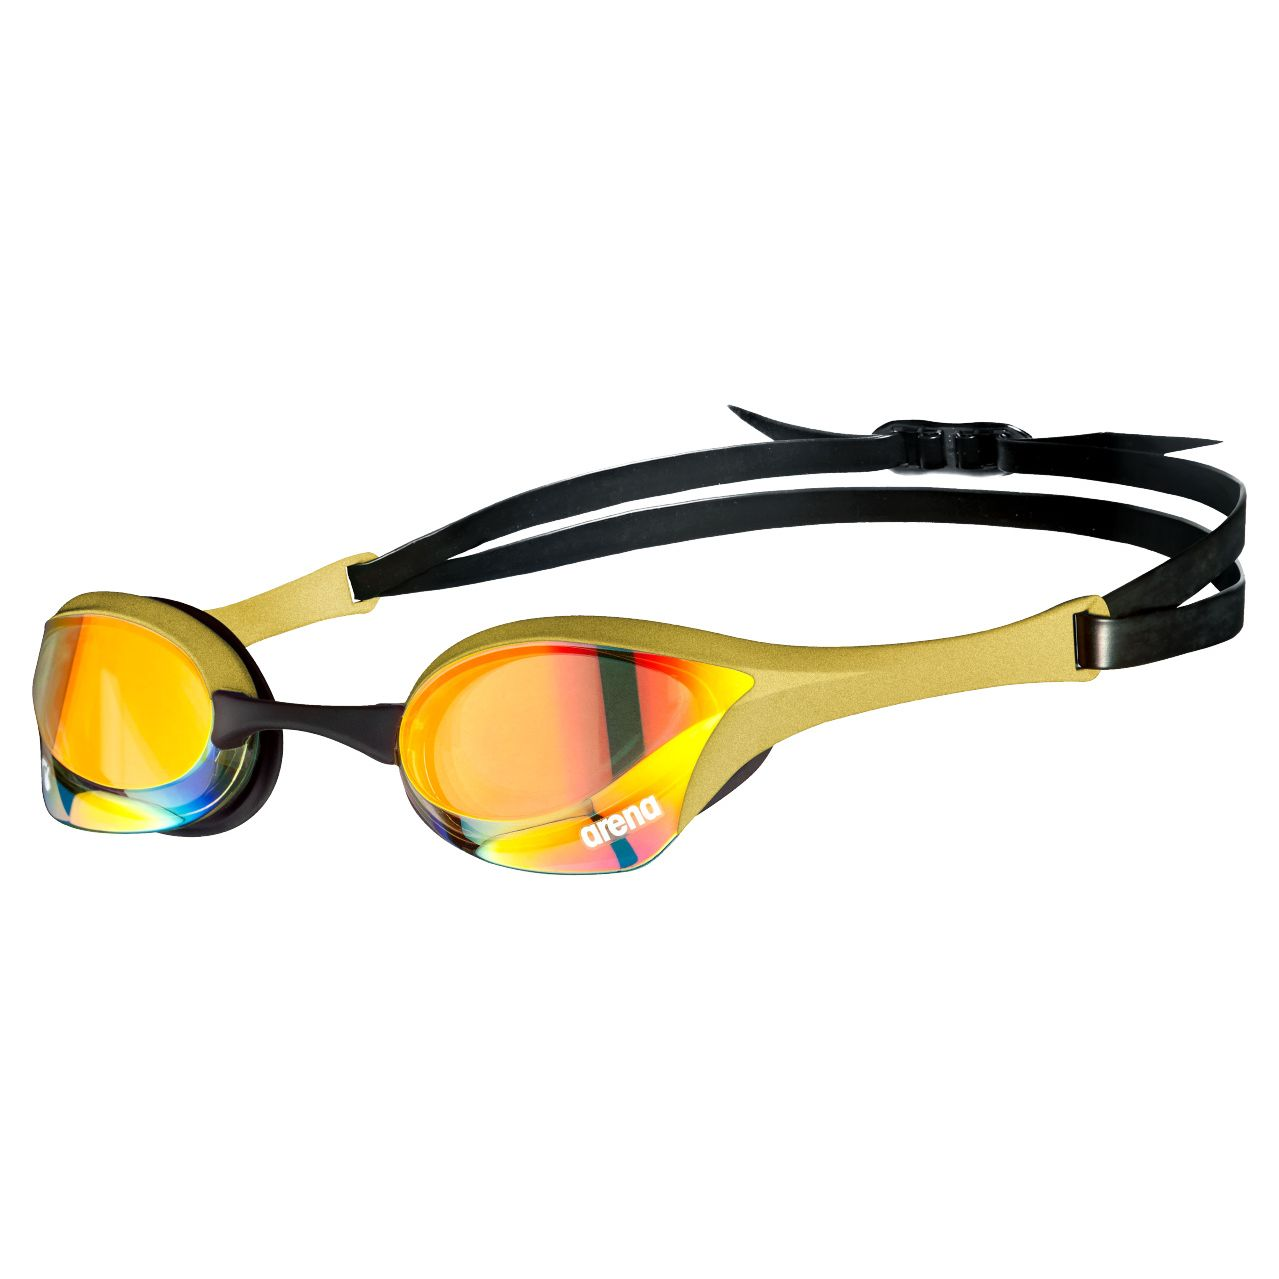 Goggles de Natación para Competición arena Unisex Cobra Ultra Swipe Mirror_6243